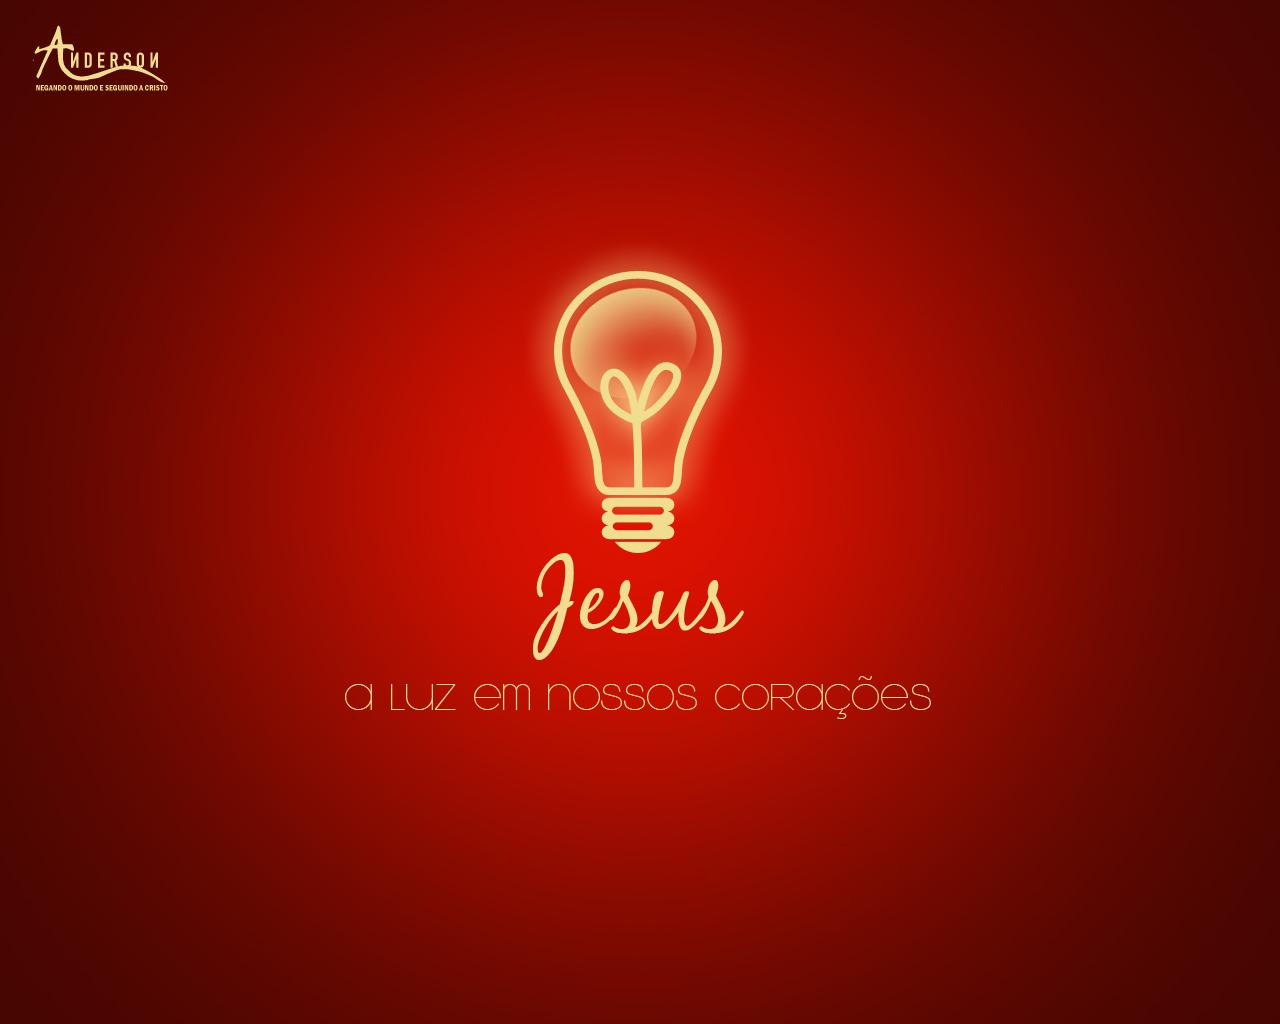 http://2.bp.blogspot.com/_cwdOsykjgVA/THfklabXrQI/AAAAAAAAAnA/LRlkAzIcWfI/s1600/6_wallpaper-jesus-a-luz-em-nossos-coracoes.jpg